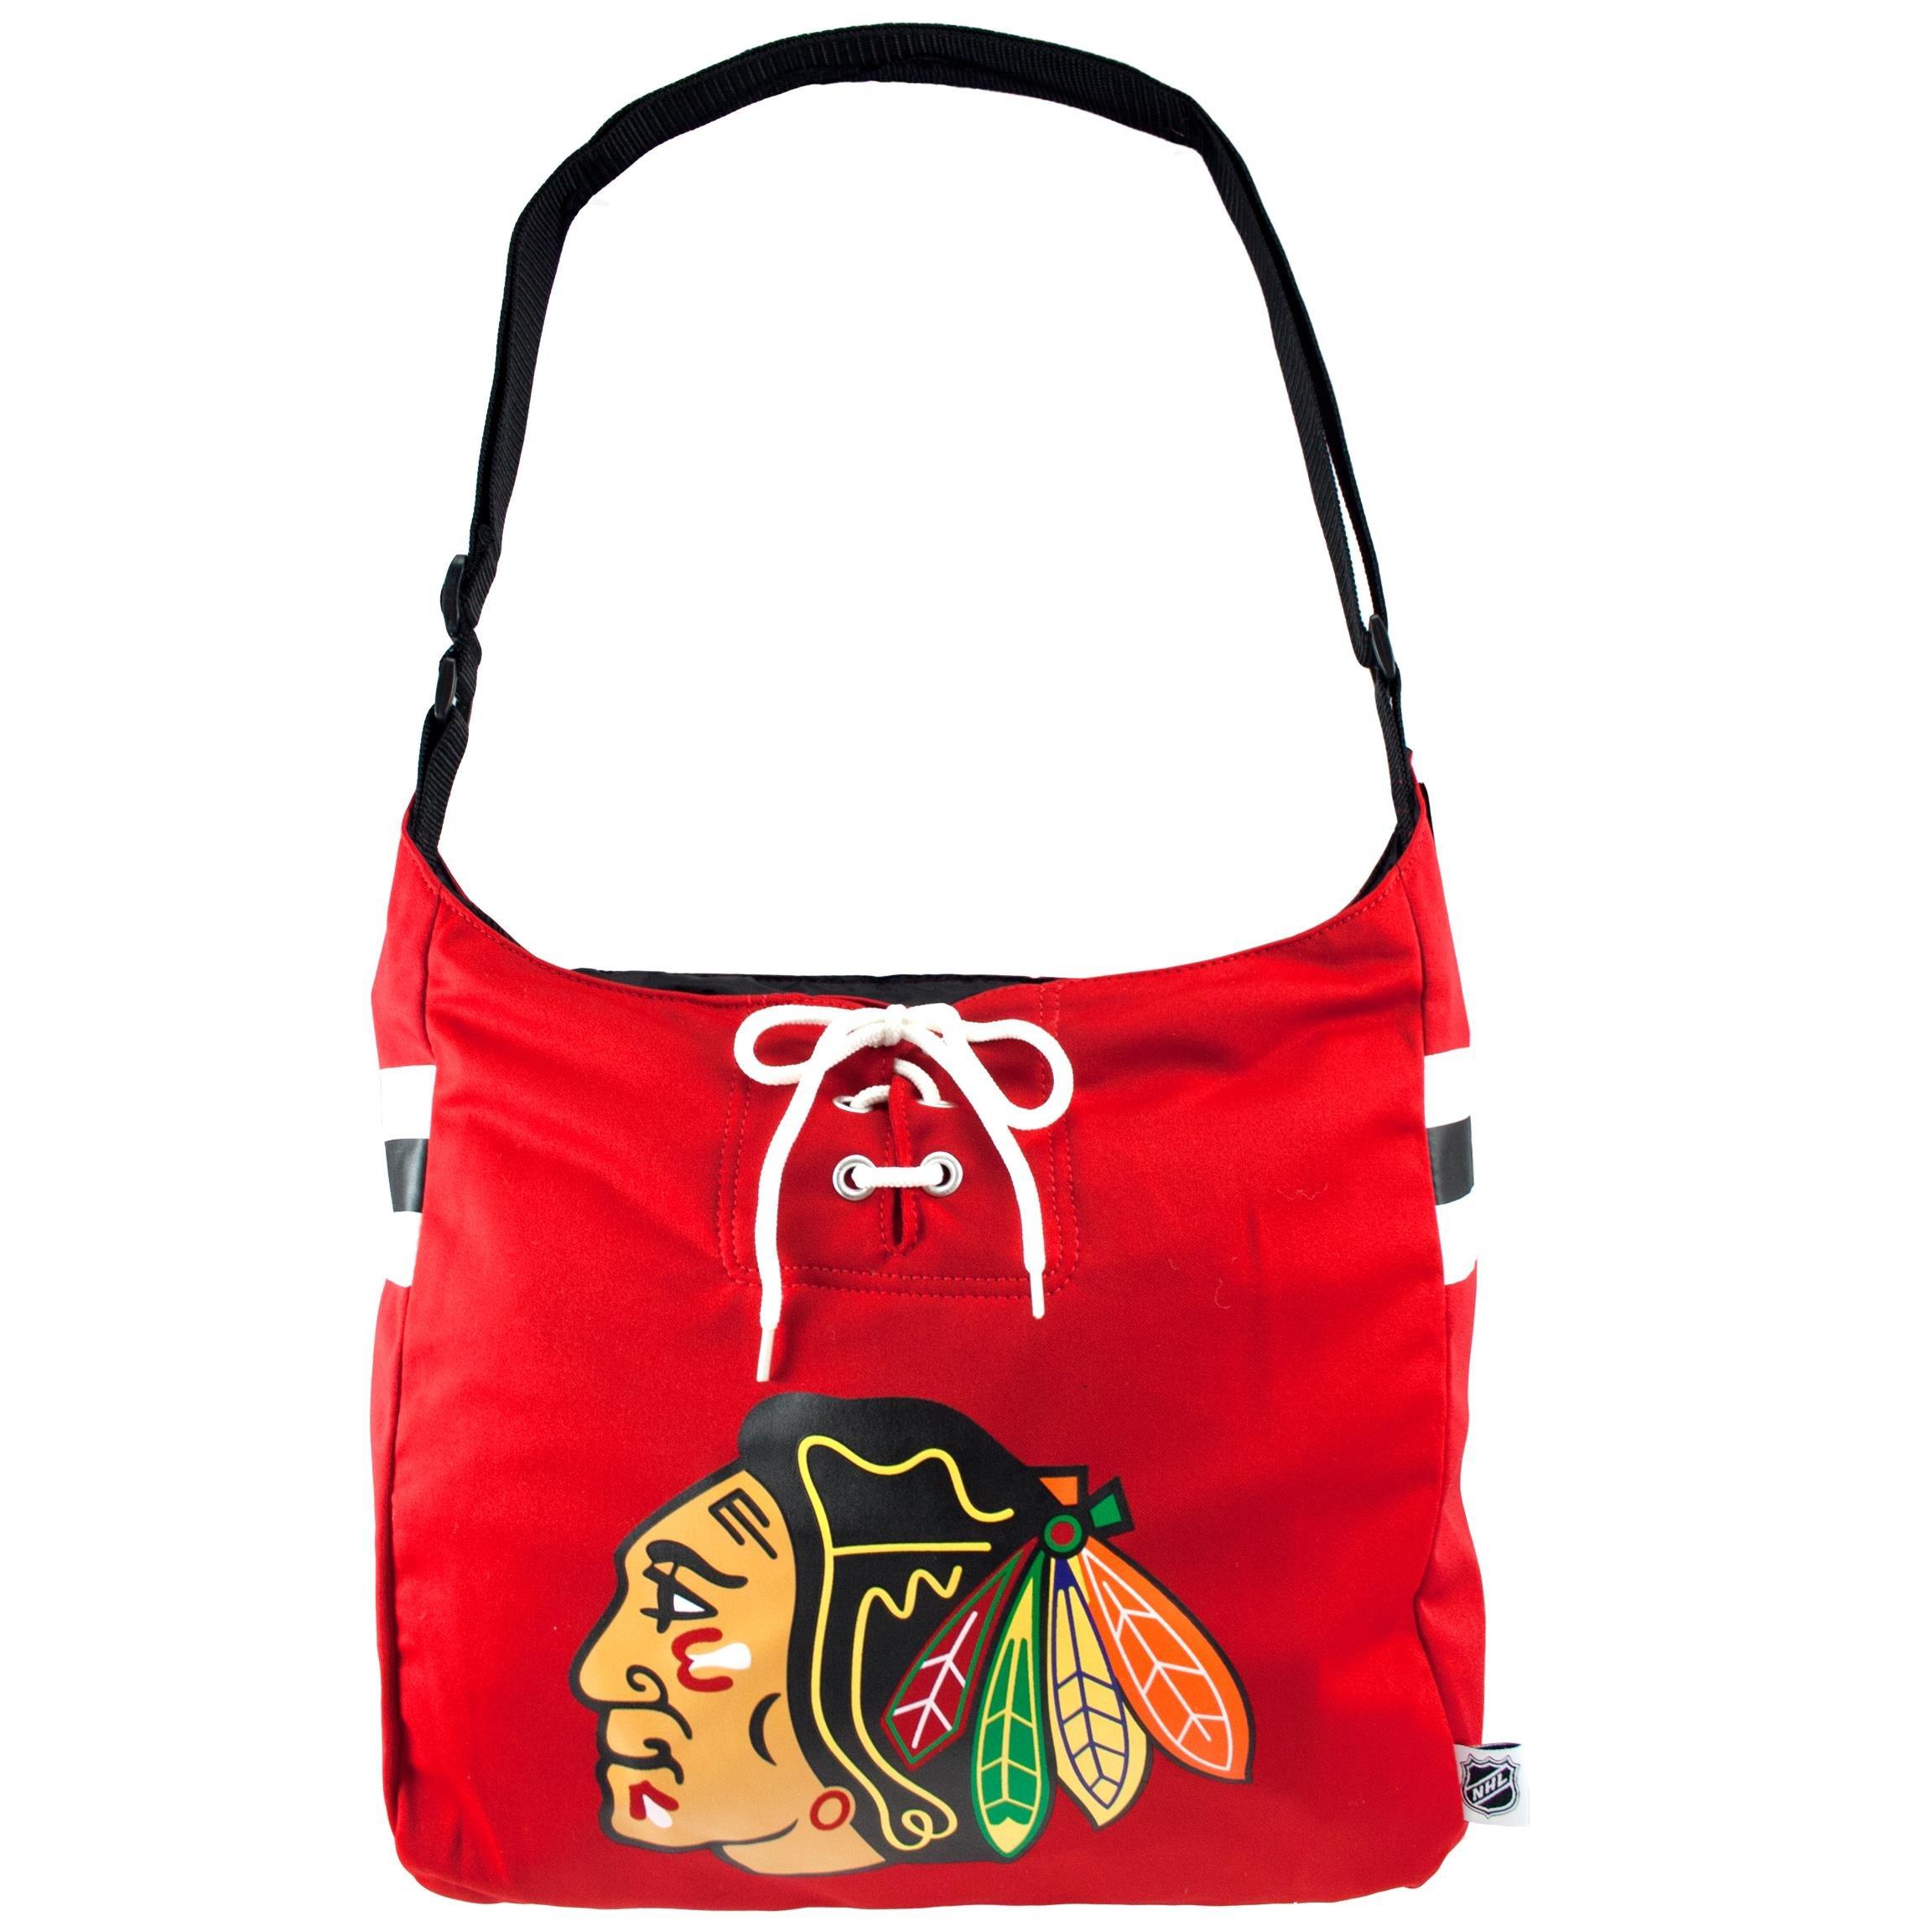 NHL Chicago Blackhawks Jersey Tote